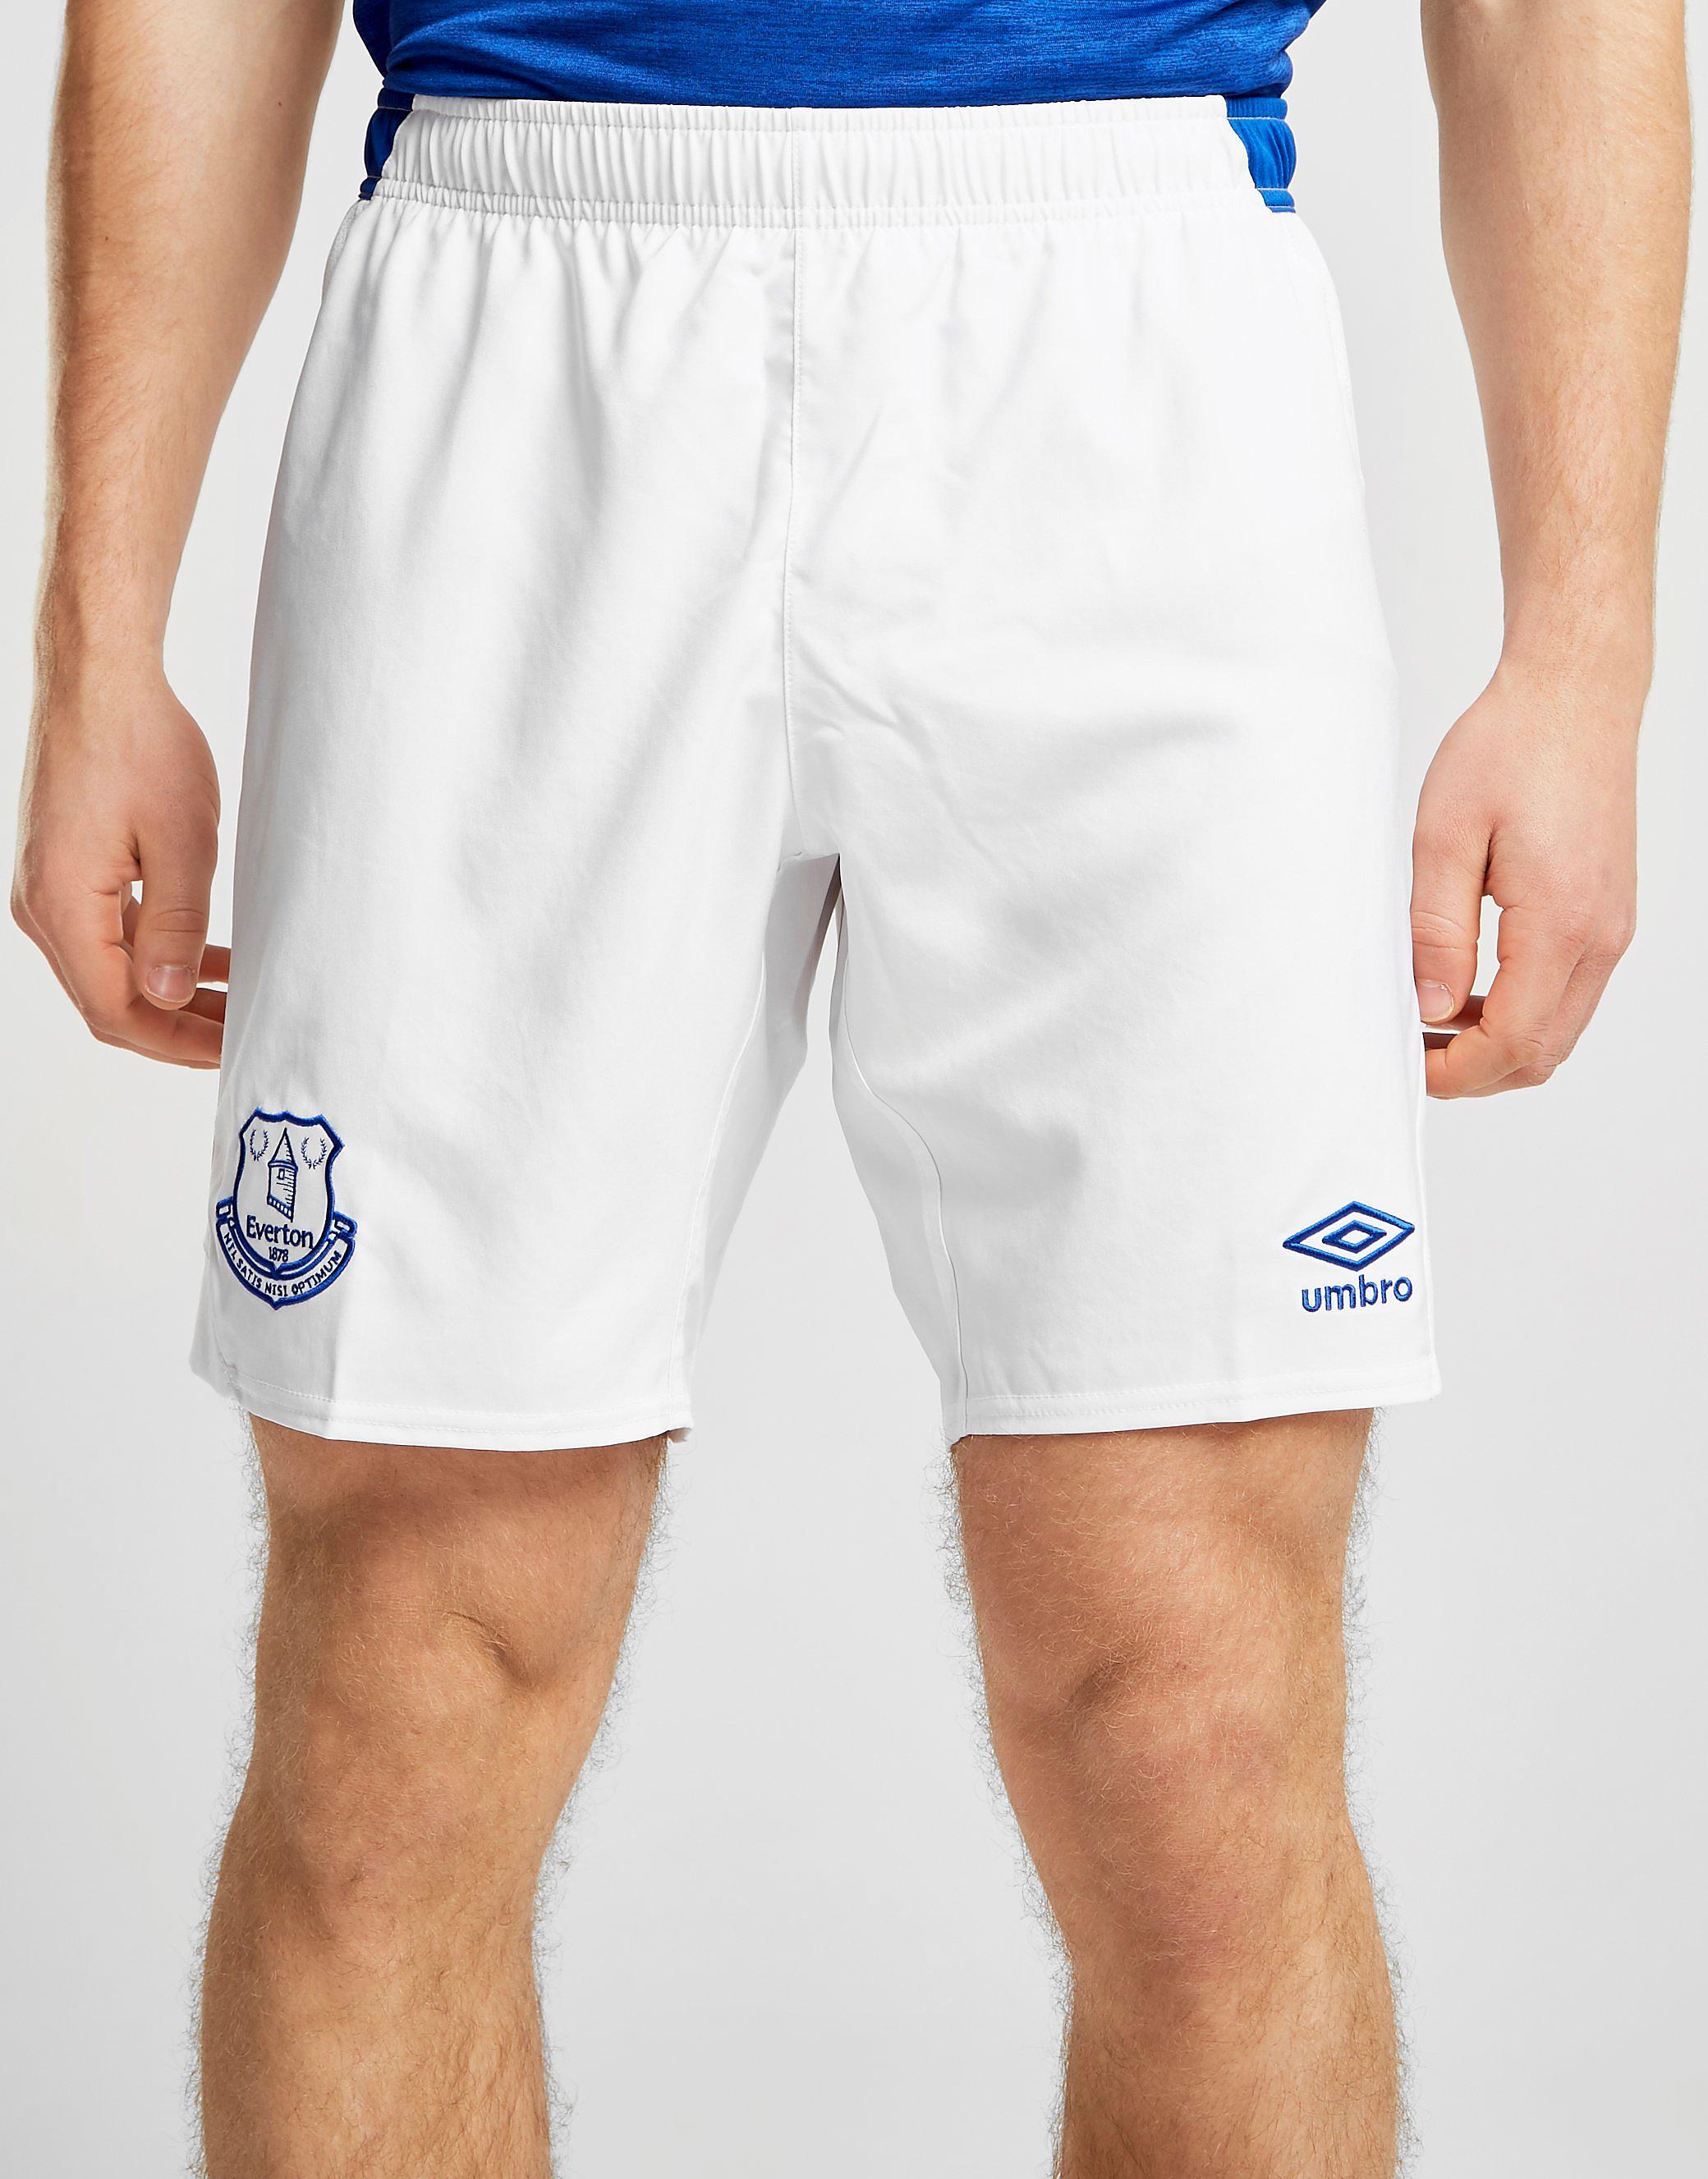 Umbro Everton FC 2018/19 Home Shorts Heren